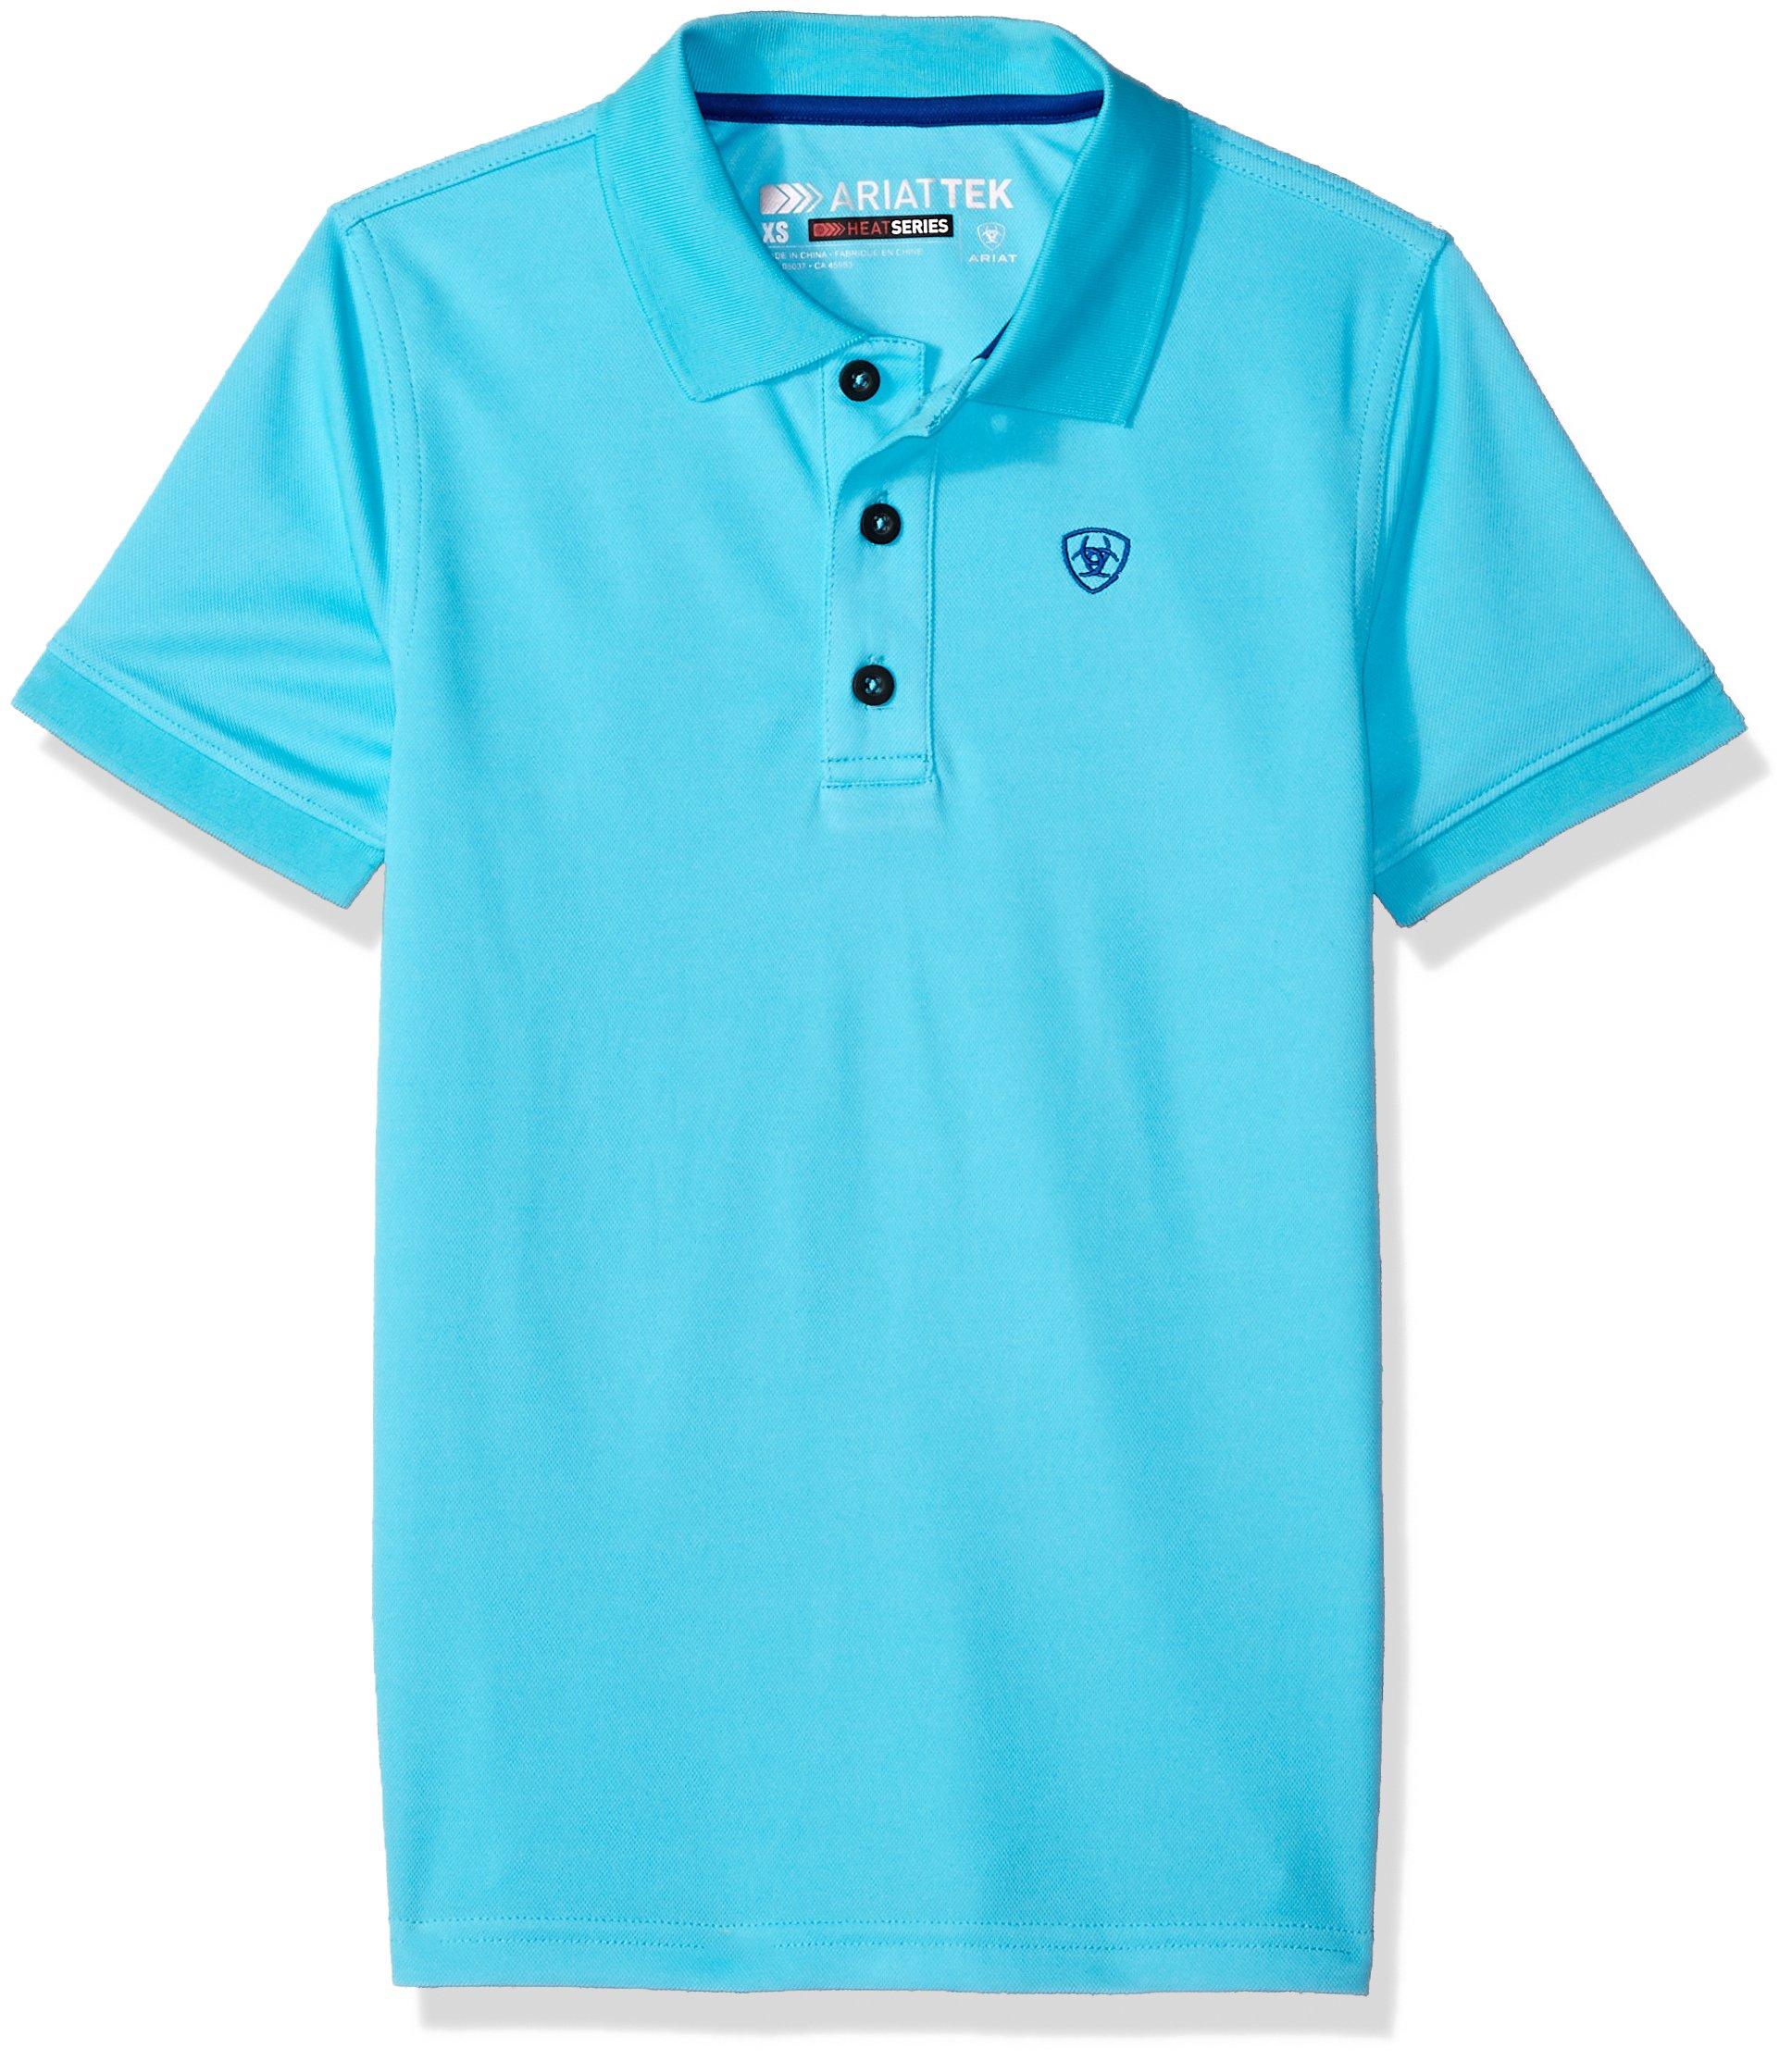 Ariat Boys' Big Tek Polo Shirt, Blue, Medium